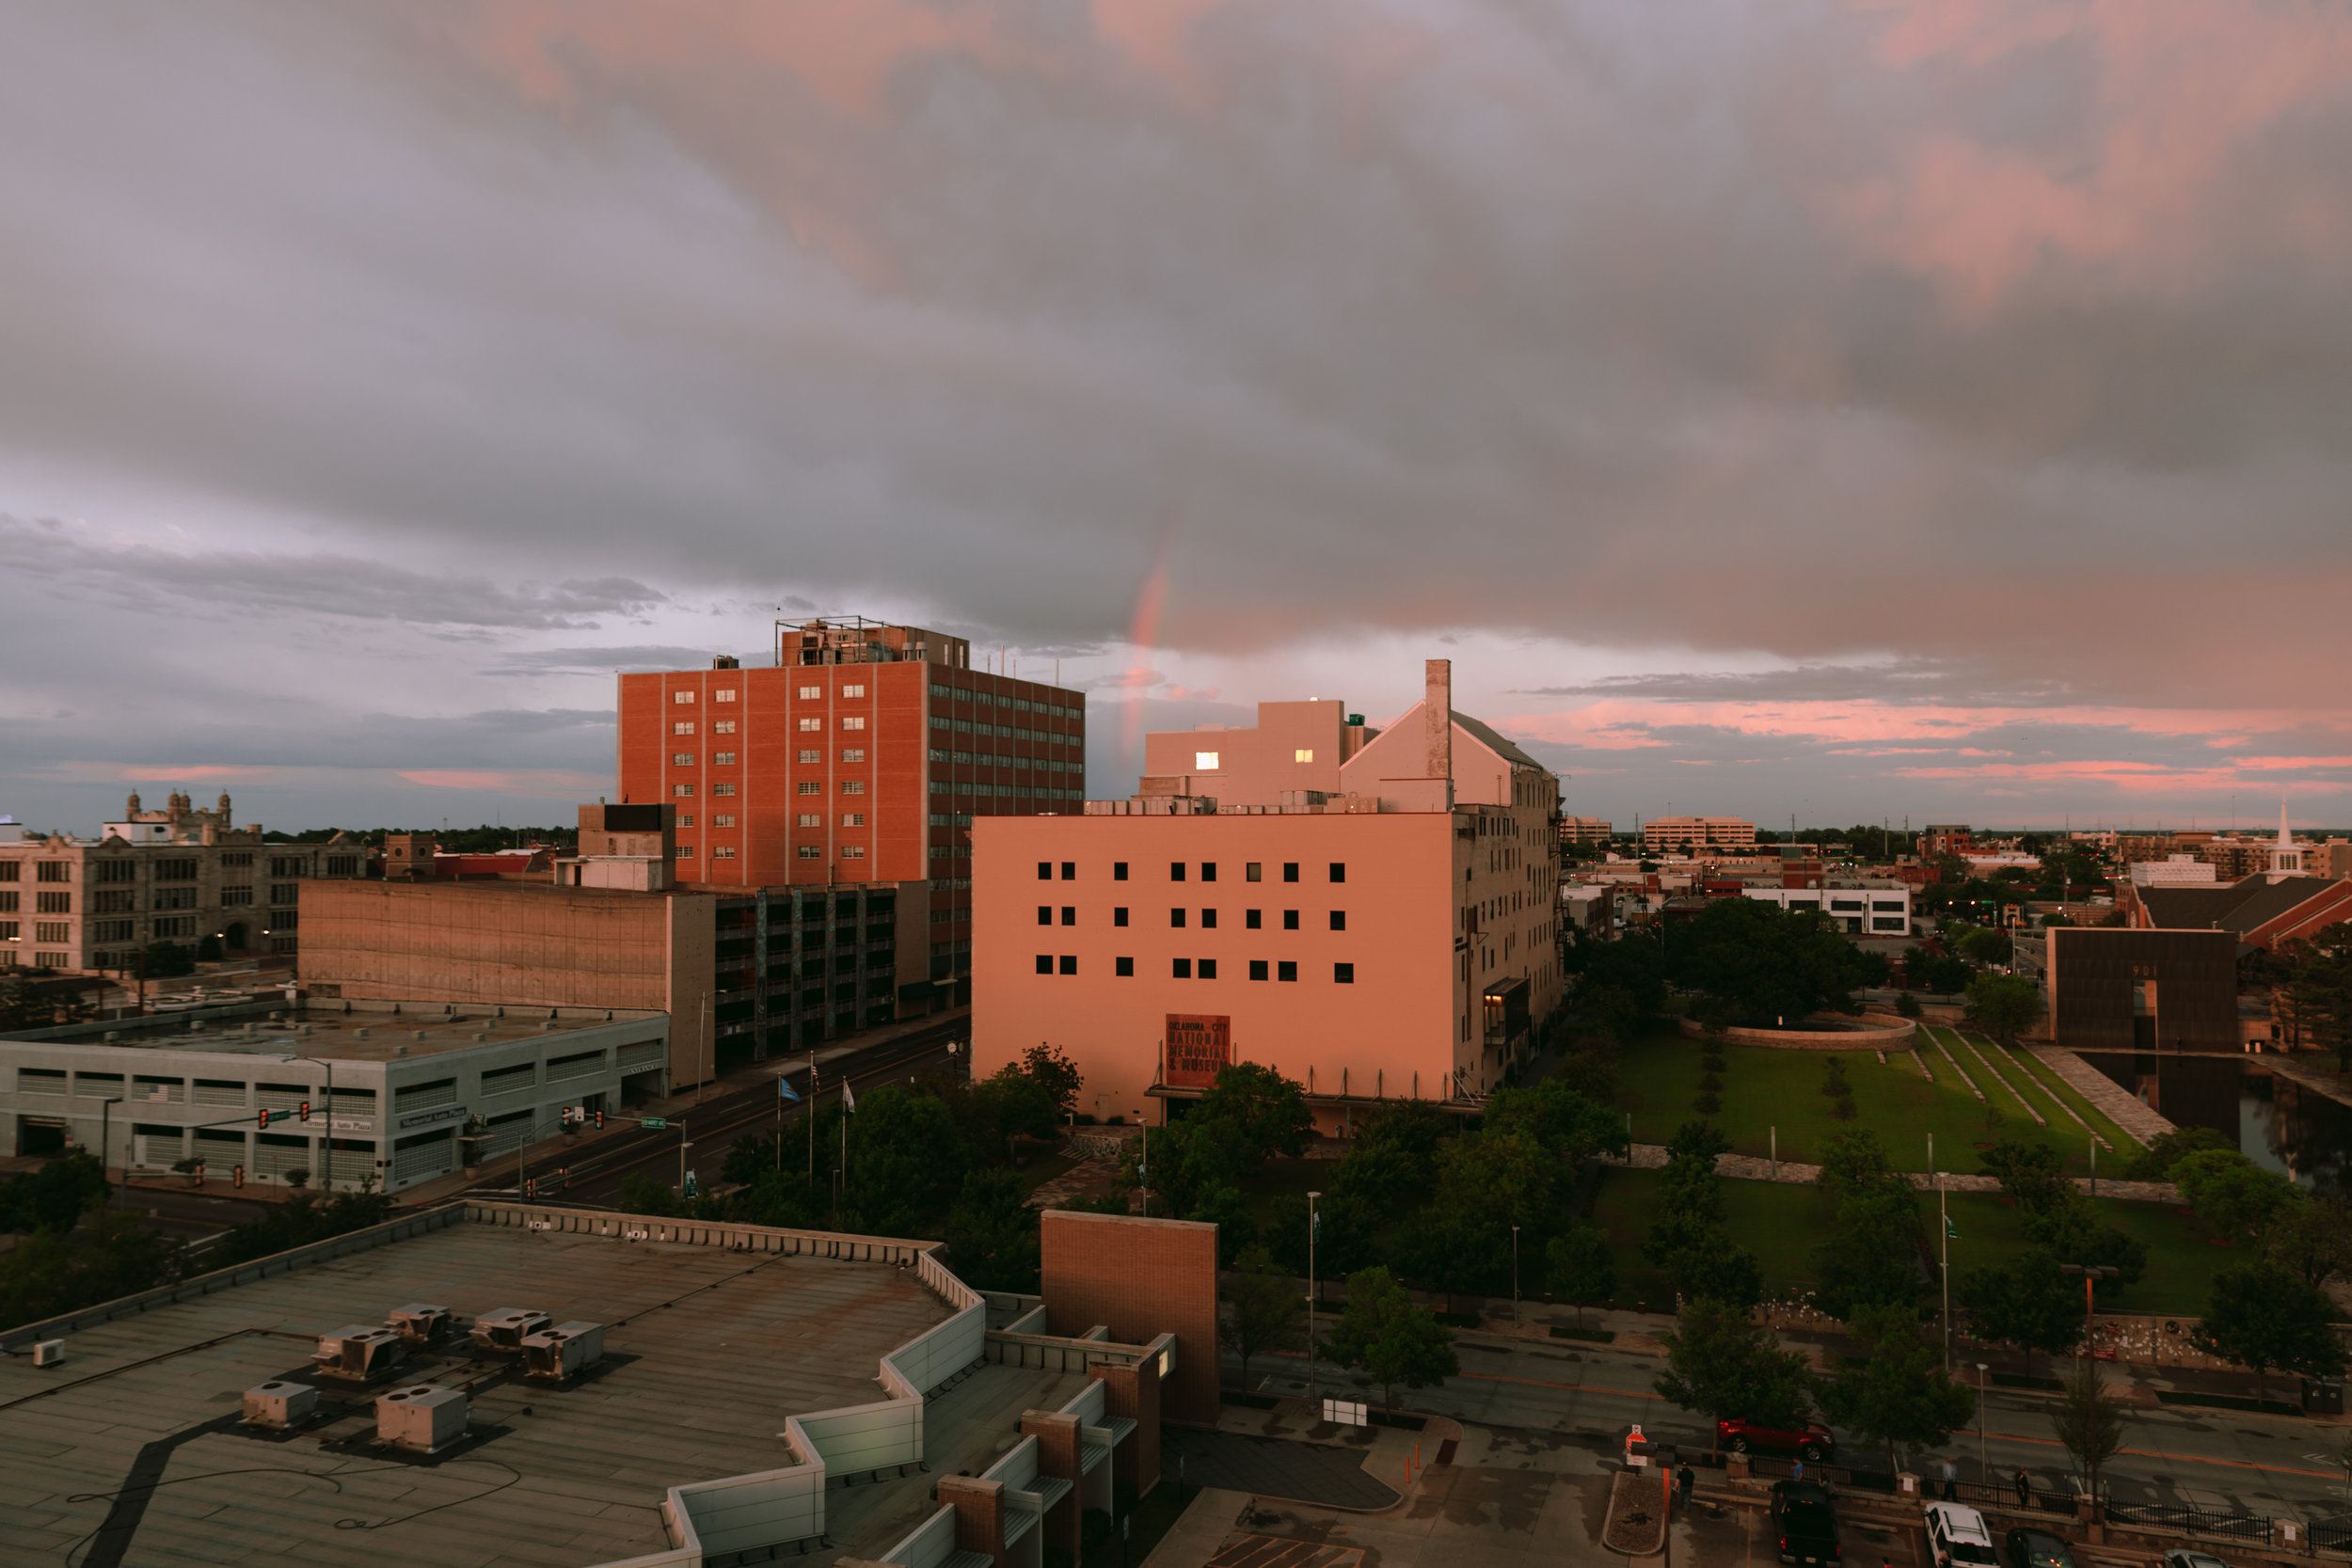 Rainbow_OklahomaCity_JonathanBurkhart.jpg